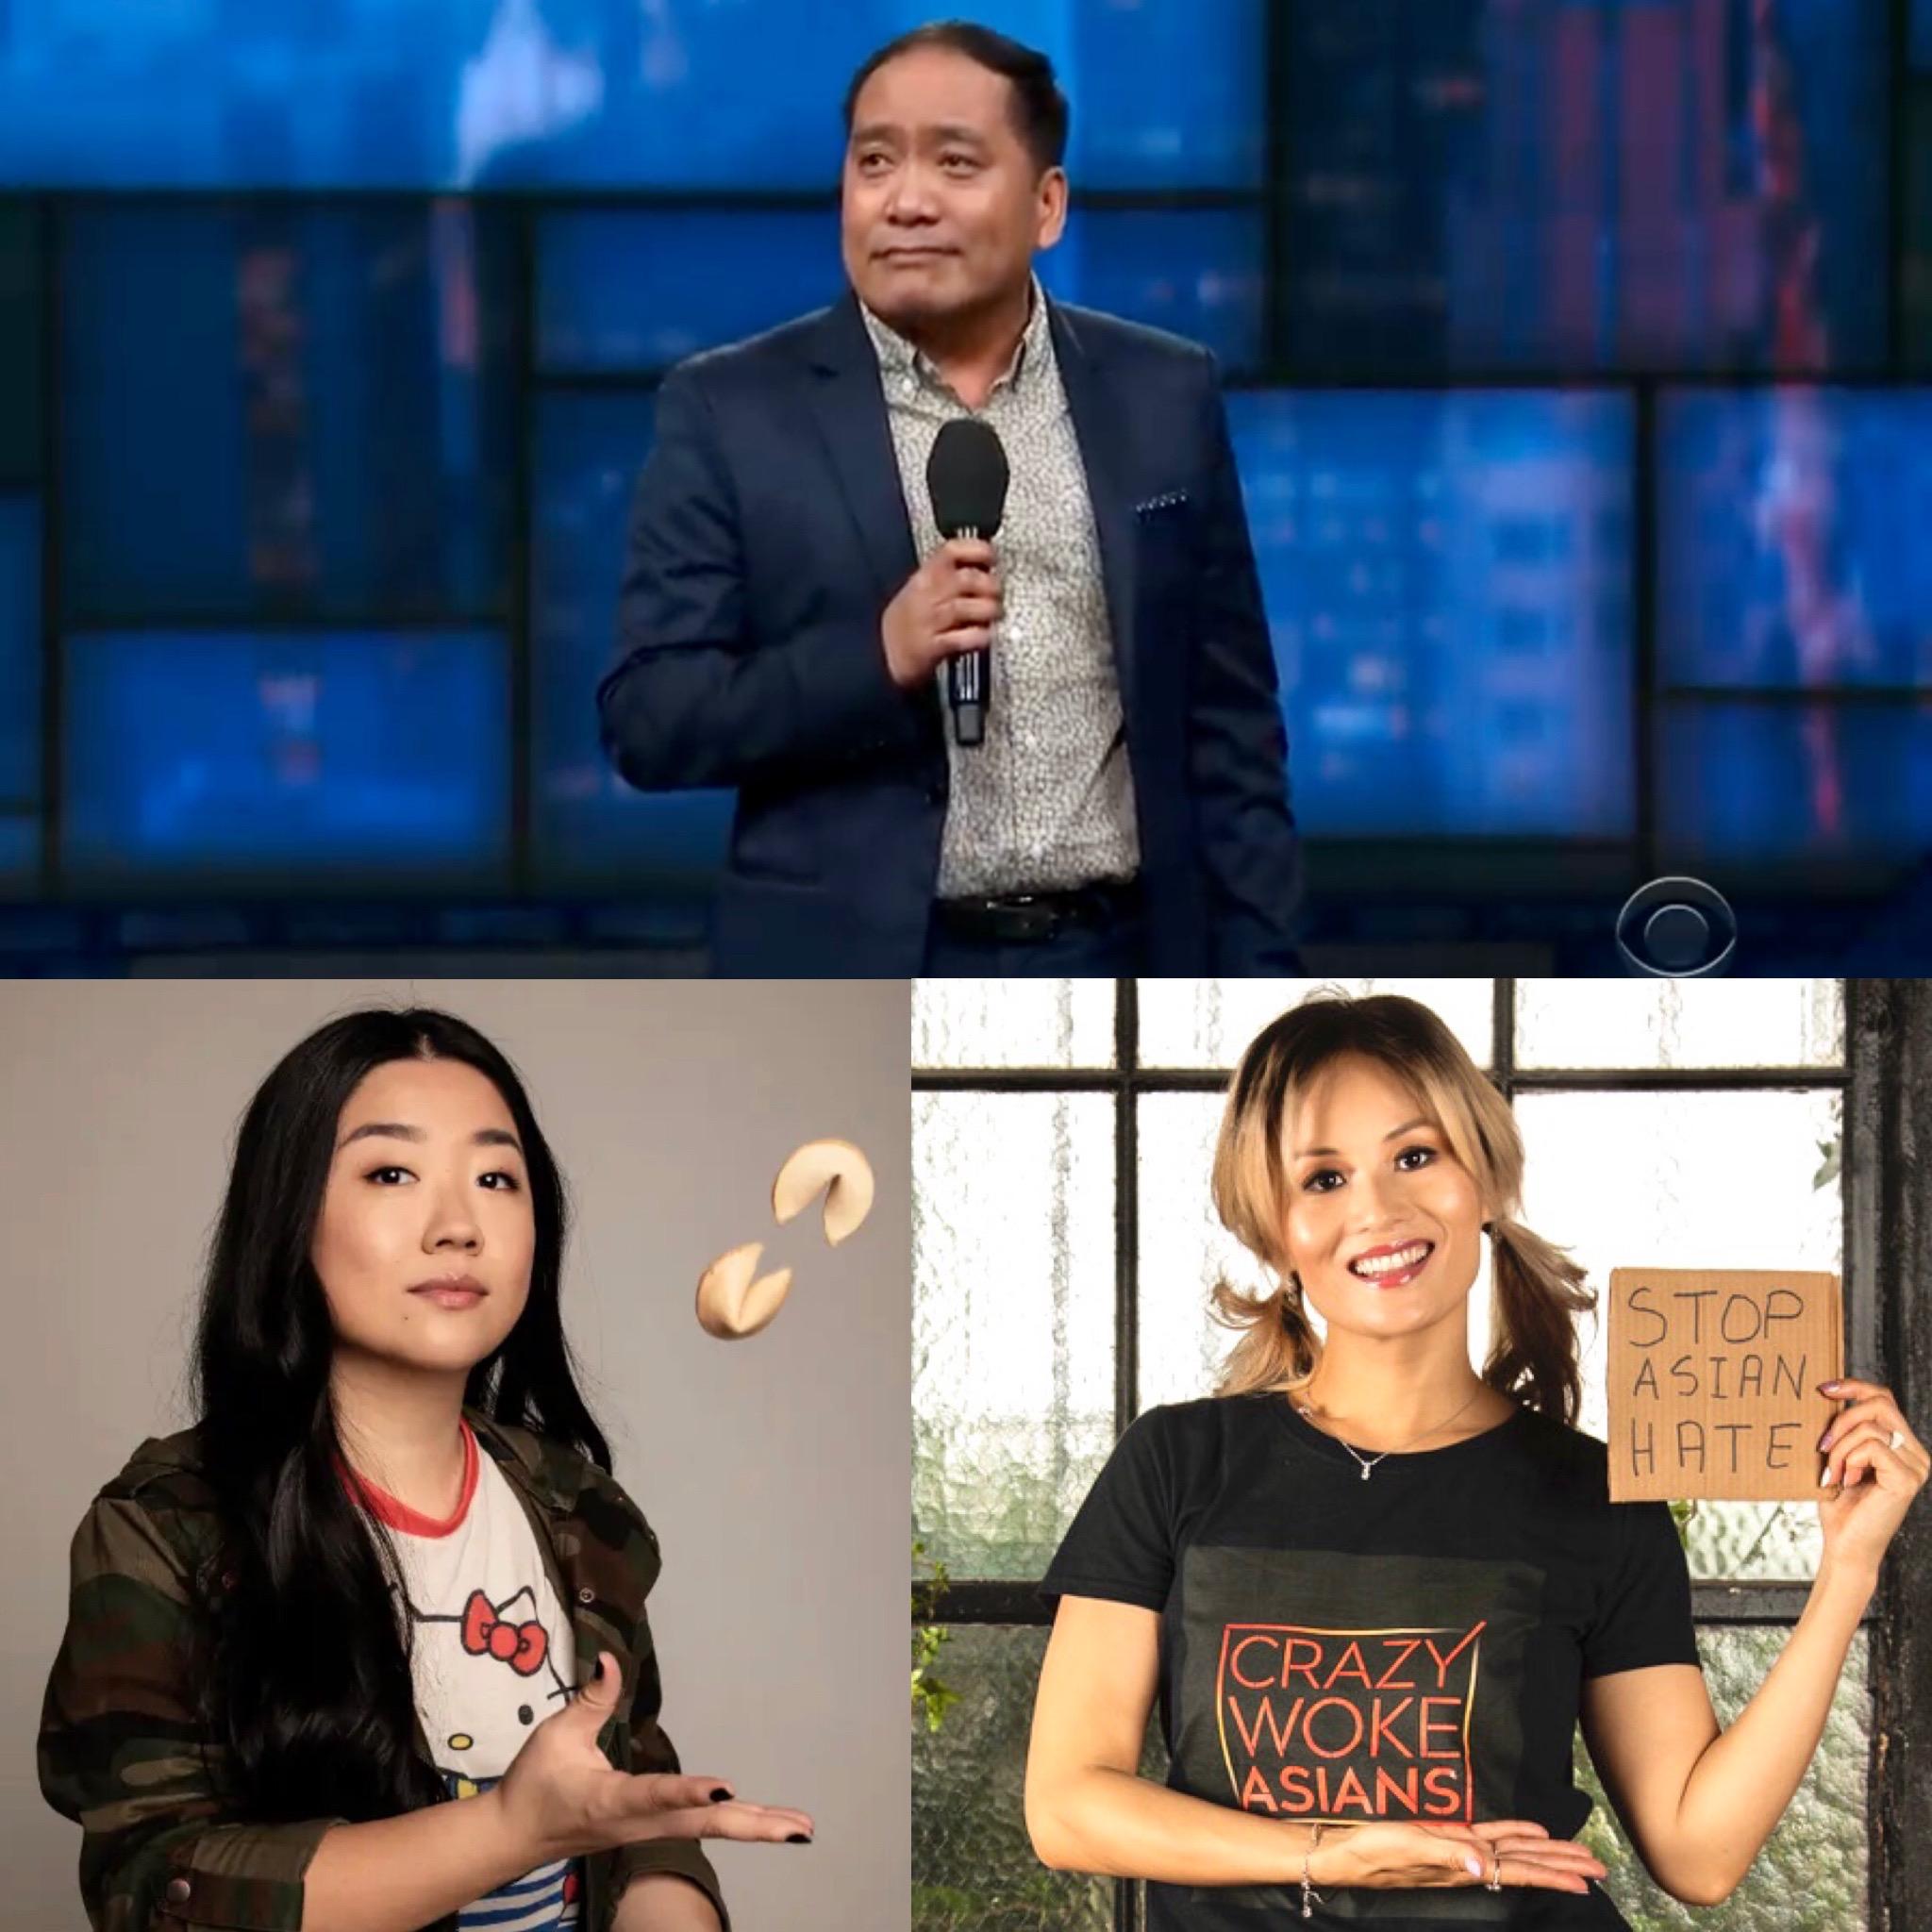 CRAZY WOKE ASIANS Comedy Show Returns April 24